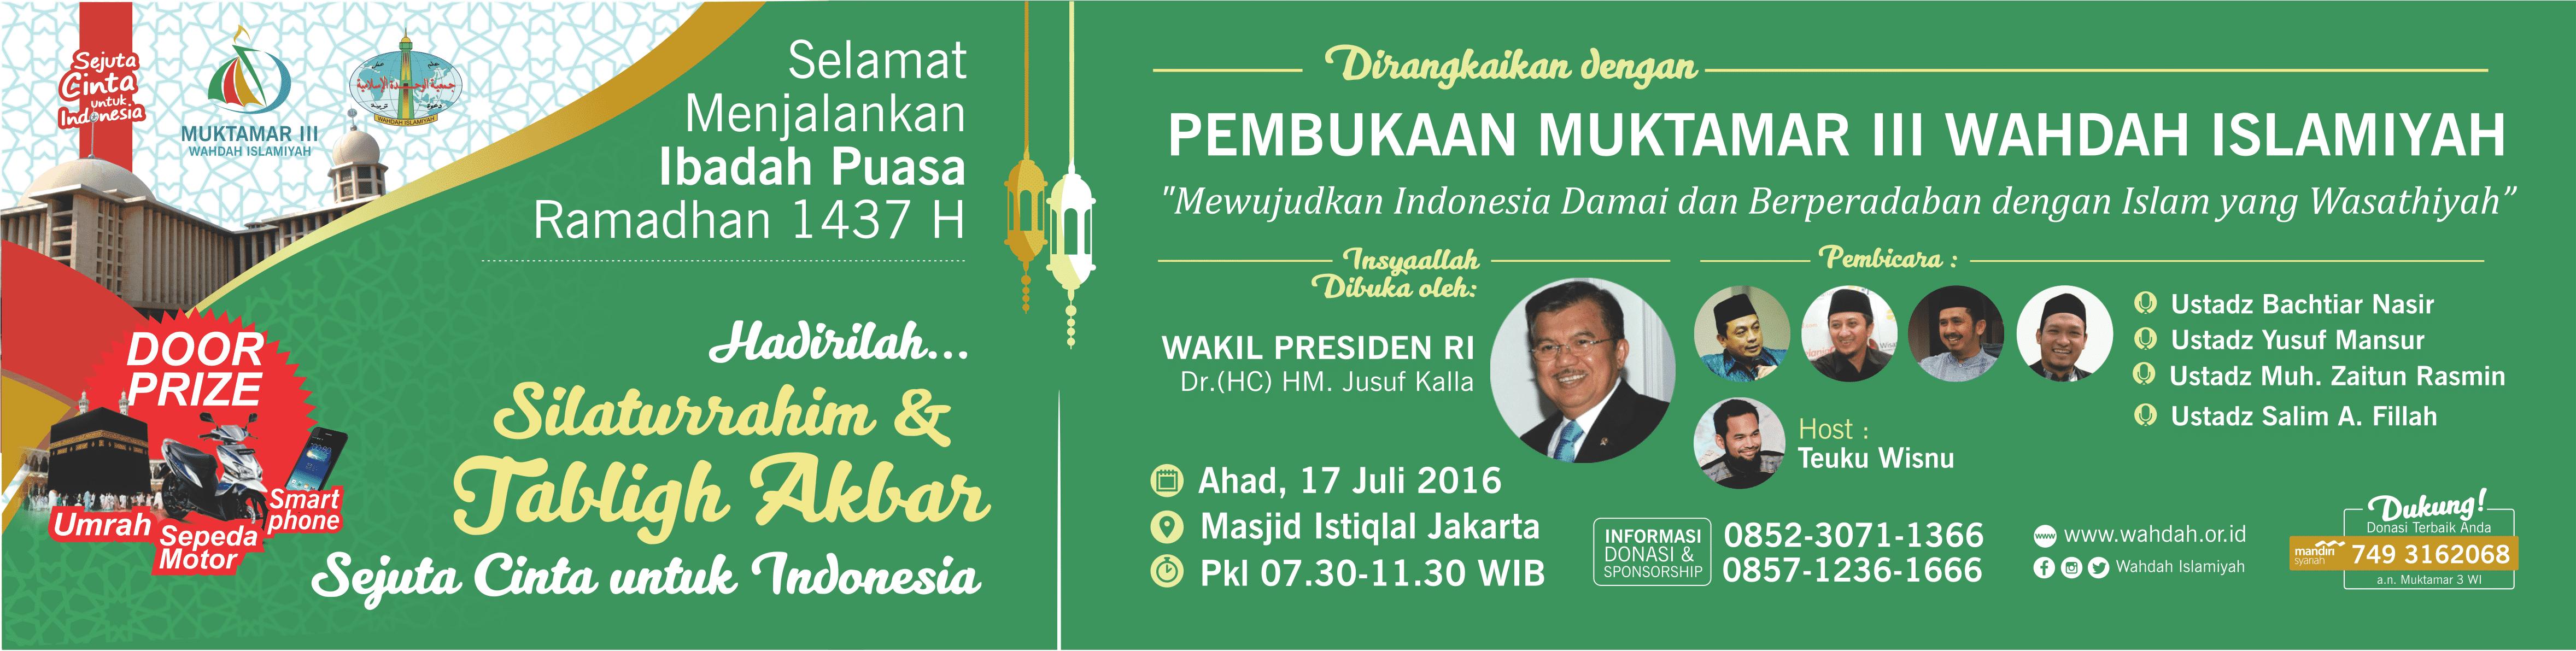 Download Muktamar Iii Wahdah Islamiyah